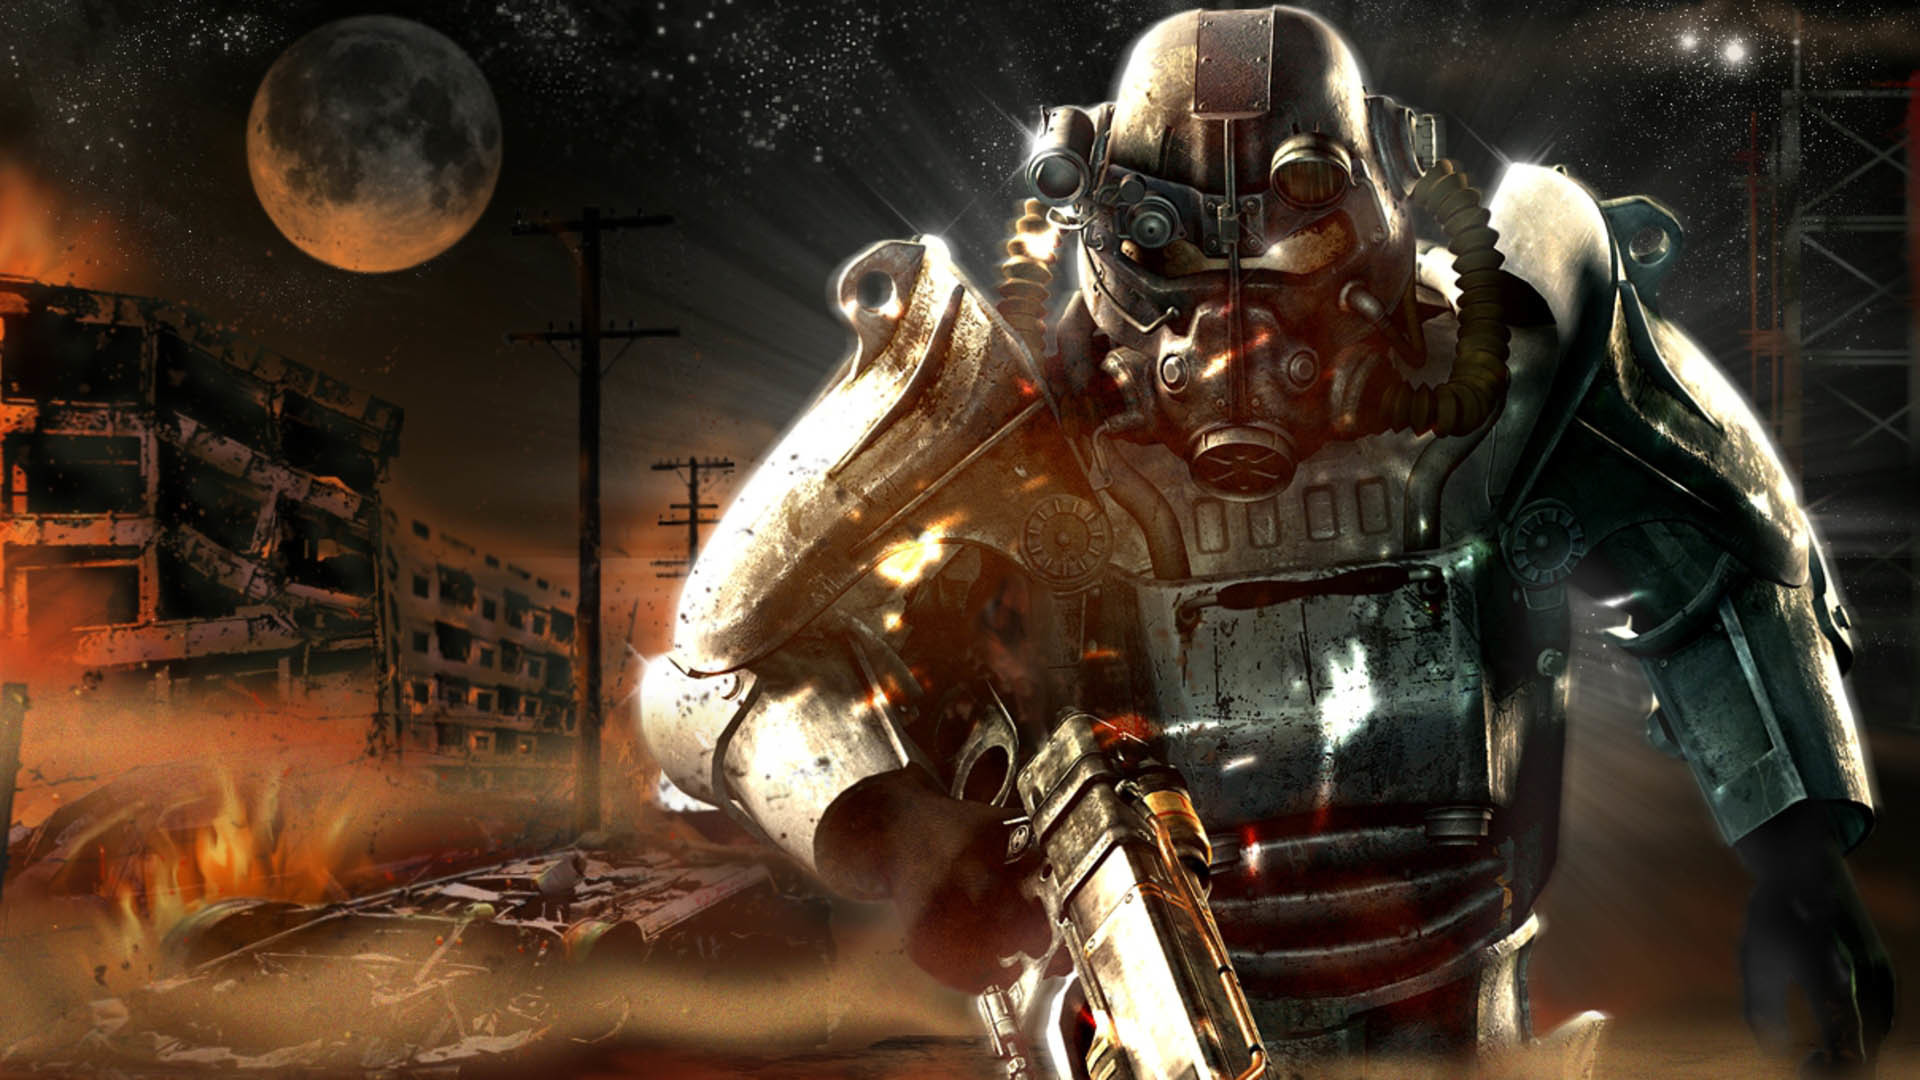 Fallout Classic Armor wallpaper